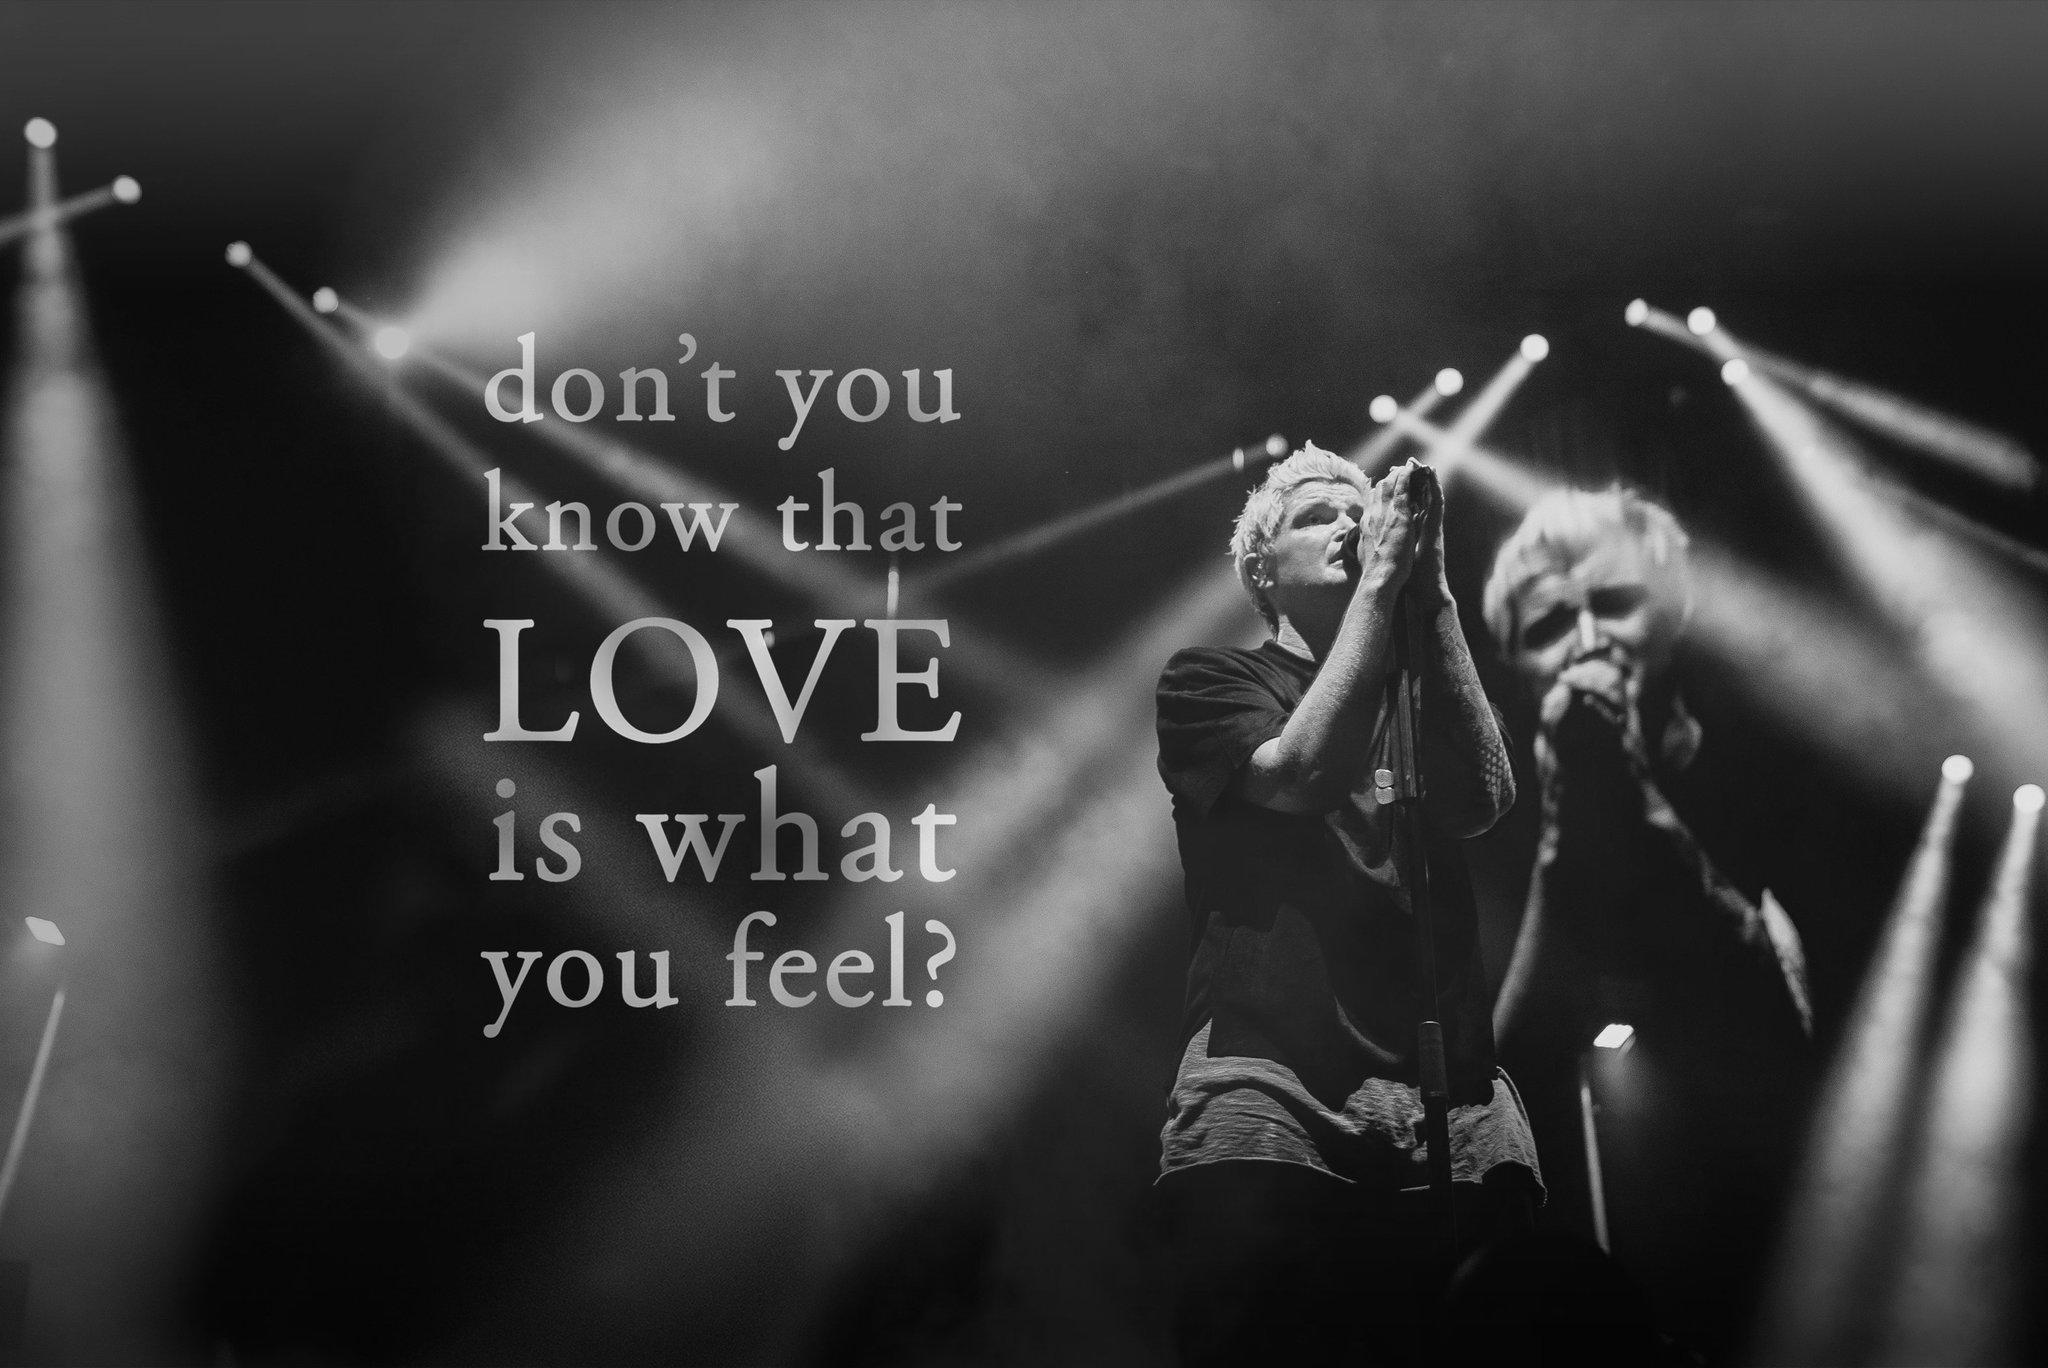 Love is blind, love is real… #CrazyWorld https://t.co/FXsanXMHLT https://t.co/IVeDu1DR1M